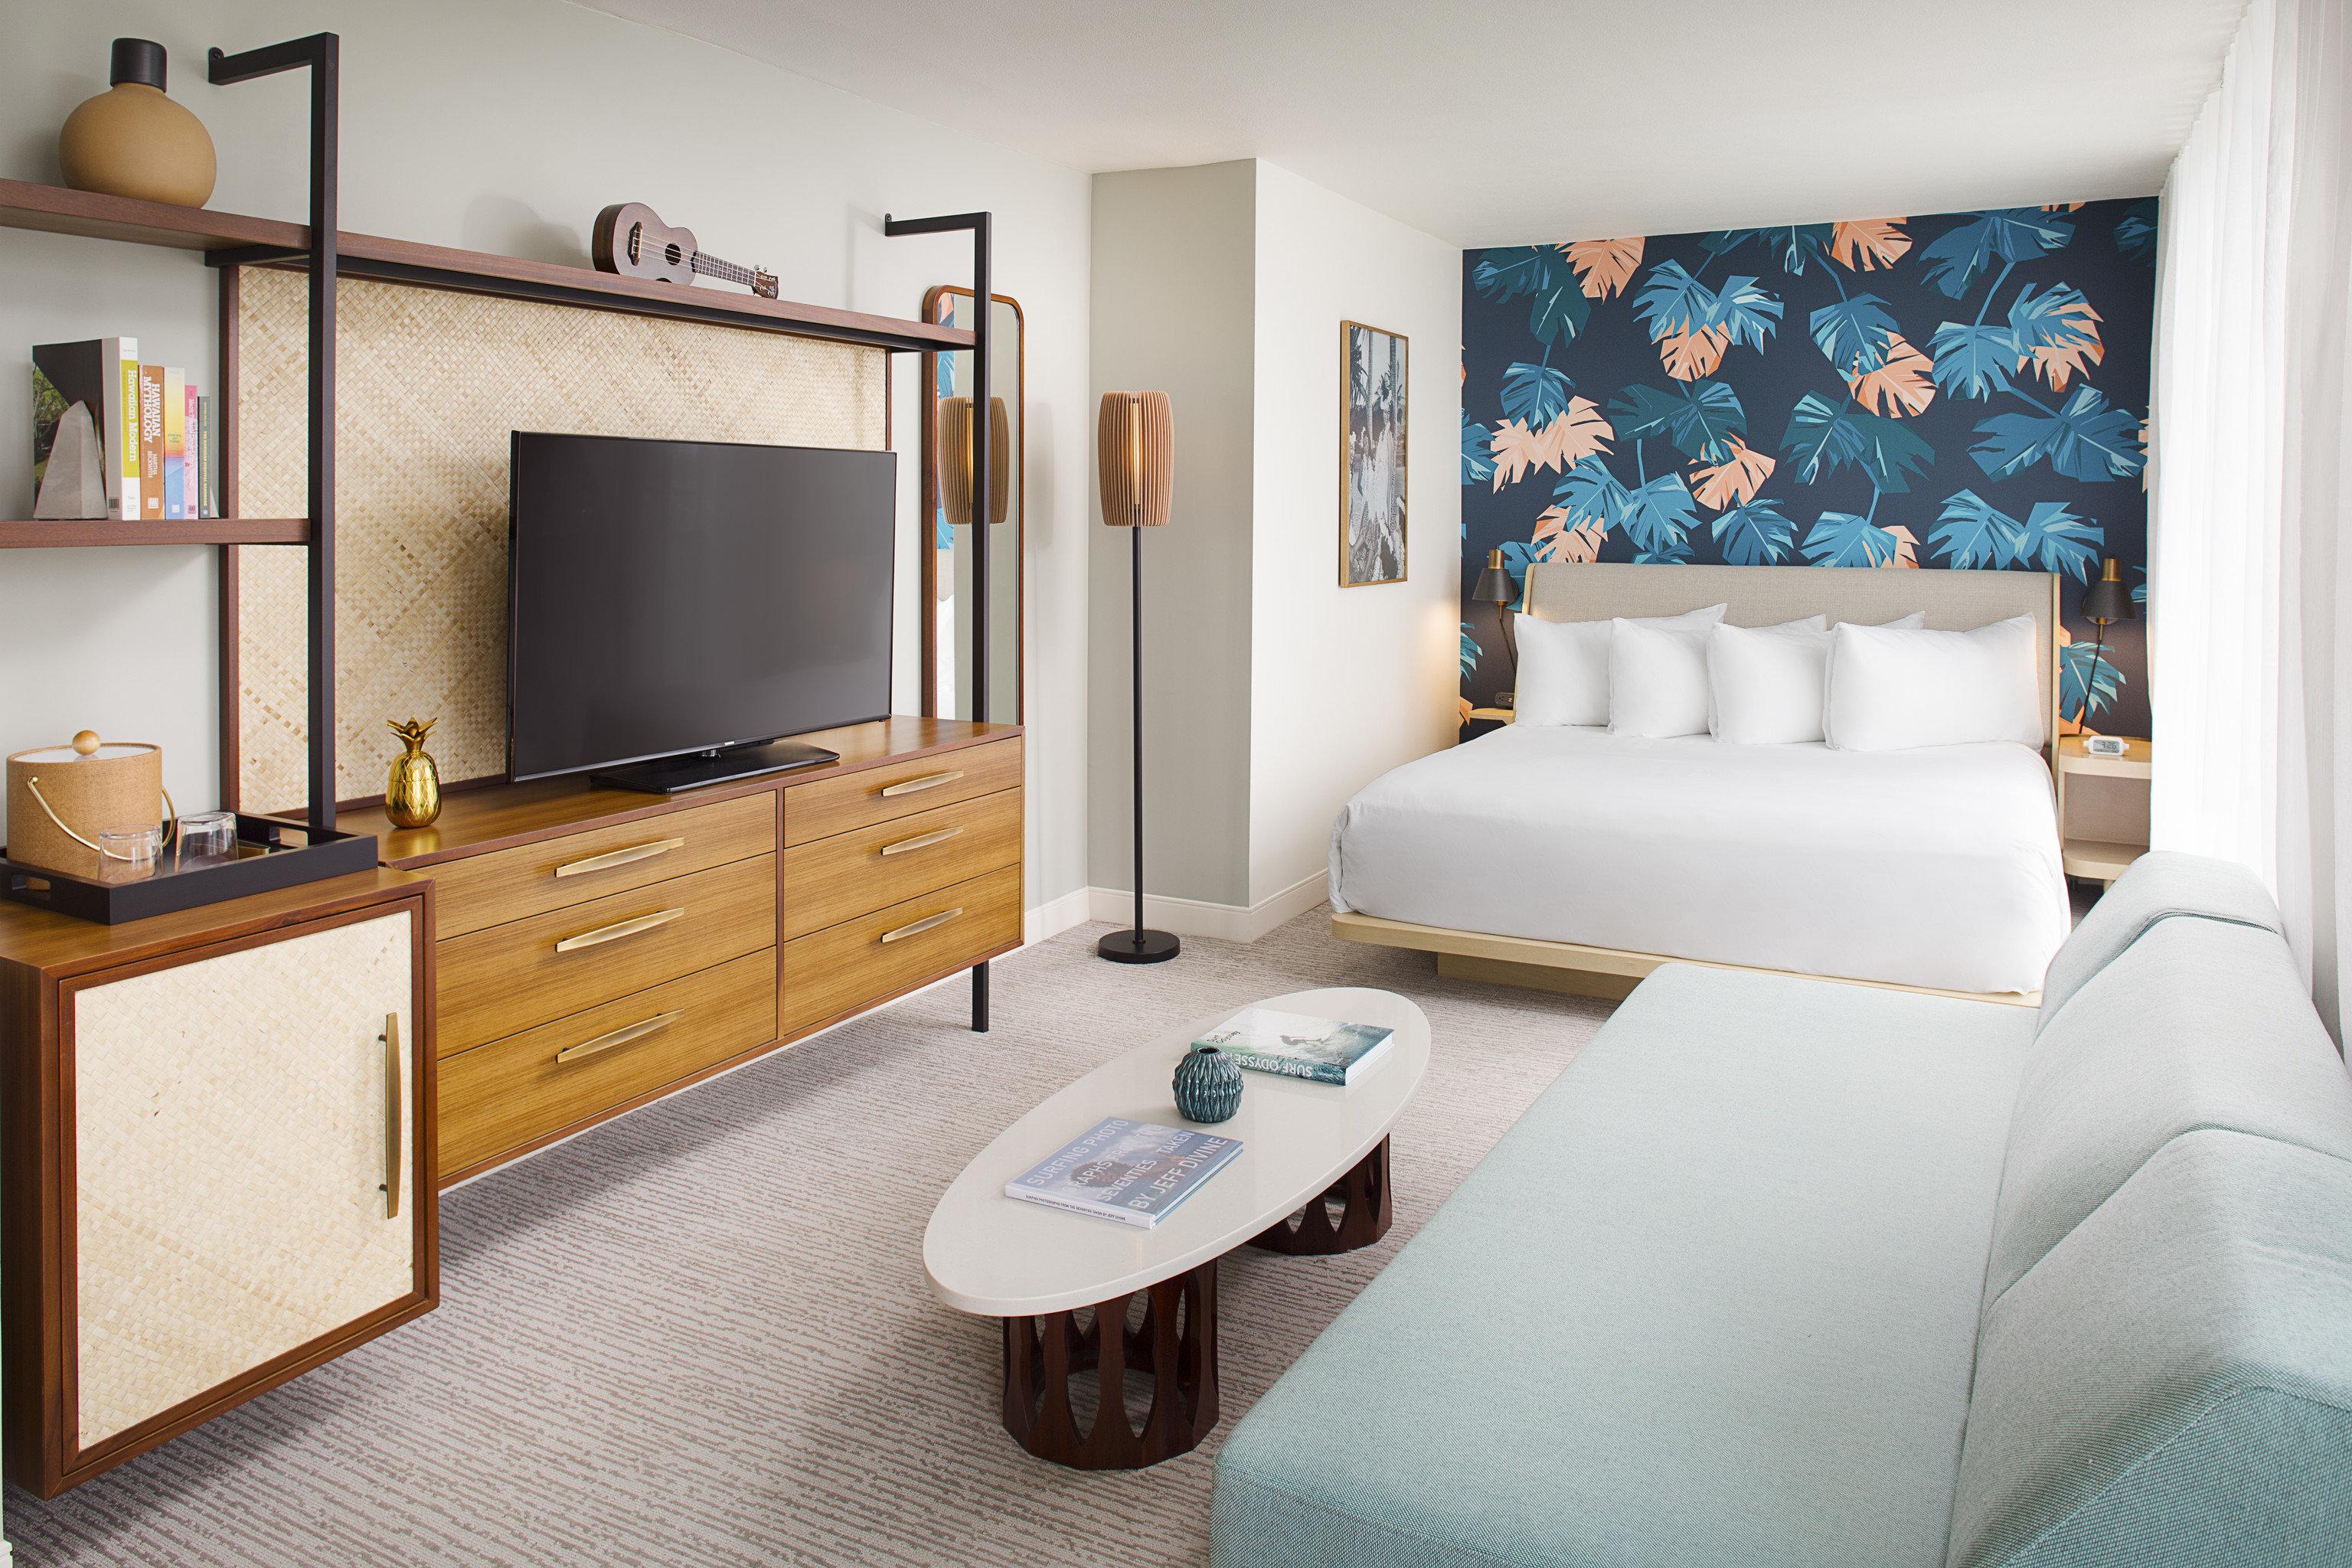 Boutique Hotels Hawaii Honolulu Hotels wall indoor floor room Living interior design living room Suite furniture Bedroom bed frame interior designer